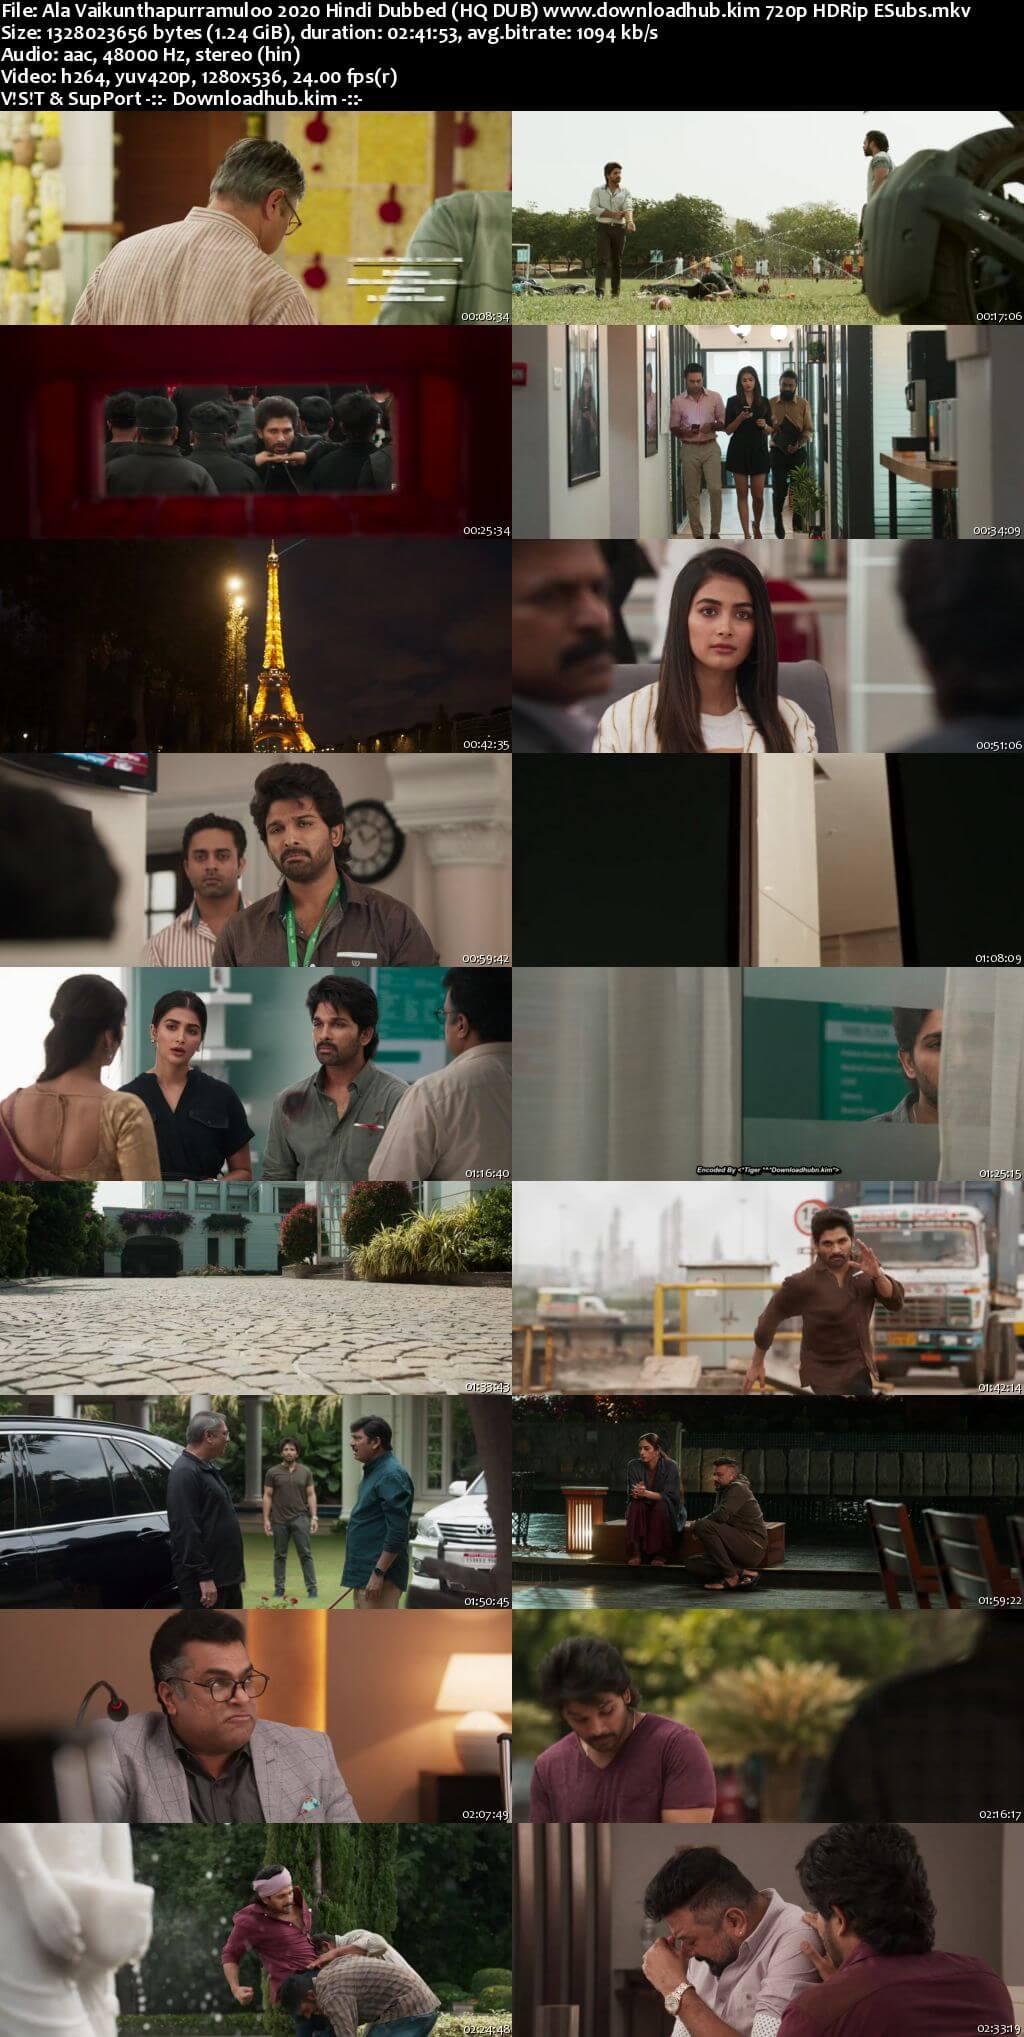 Ala Vaikunthapurramuloo 2020 Hindi Dubbed (HQ DUB) 720p HDRip ESubs